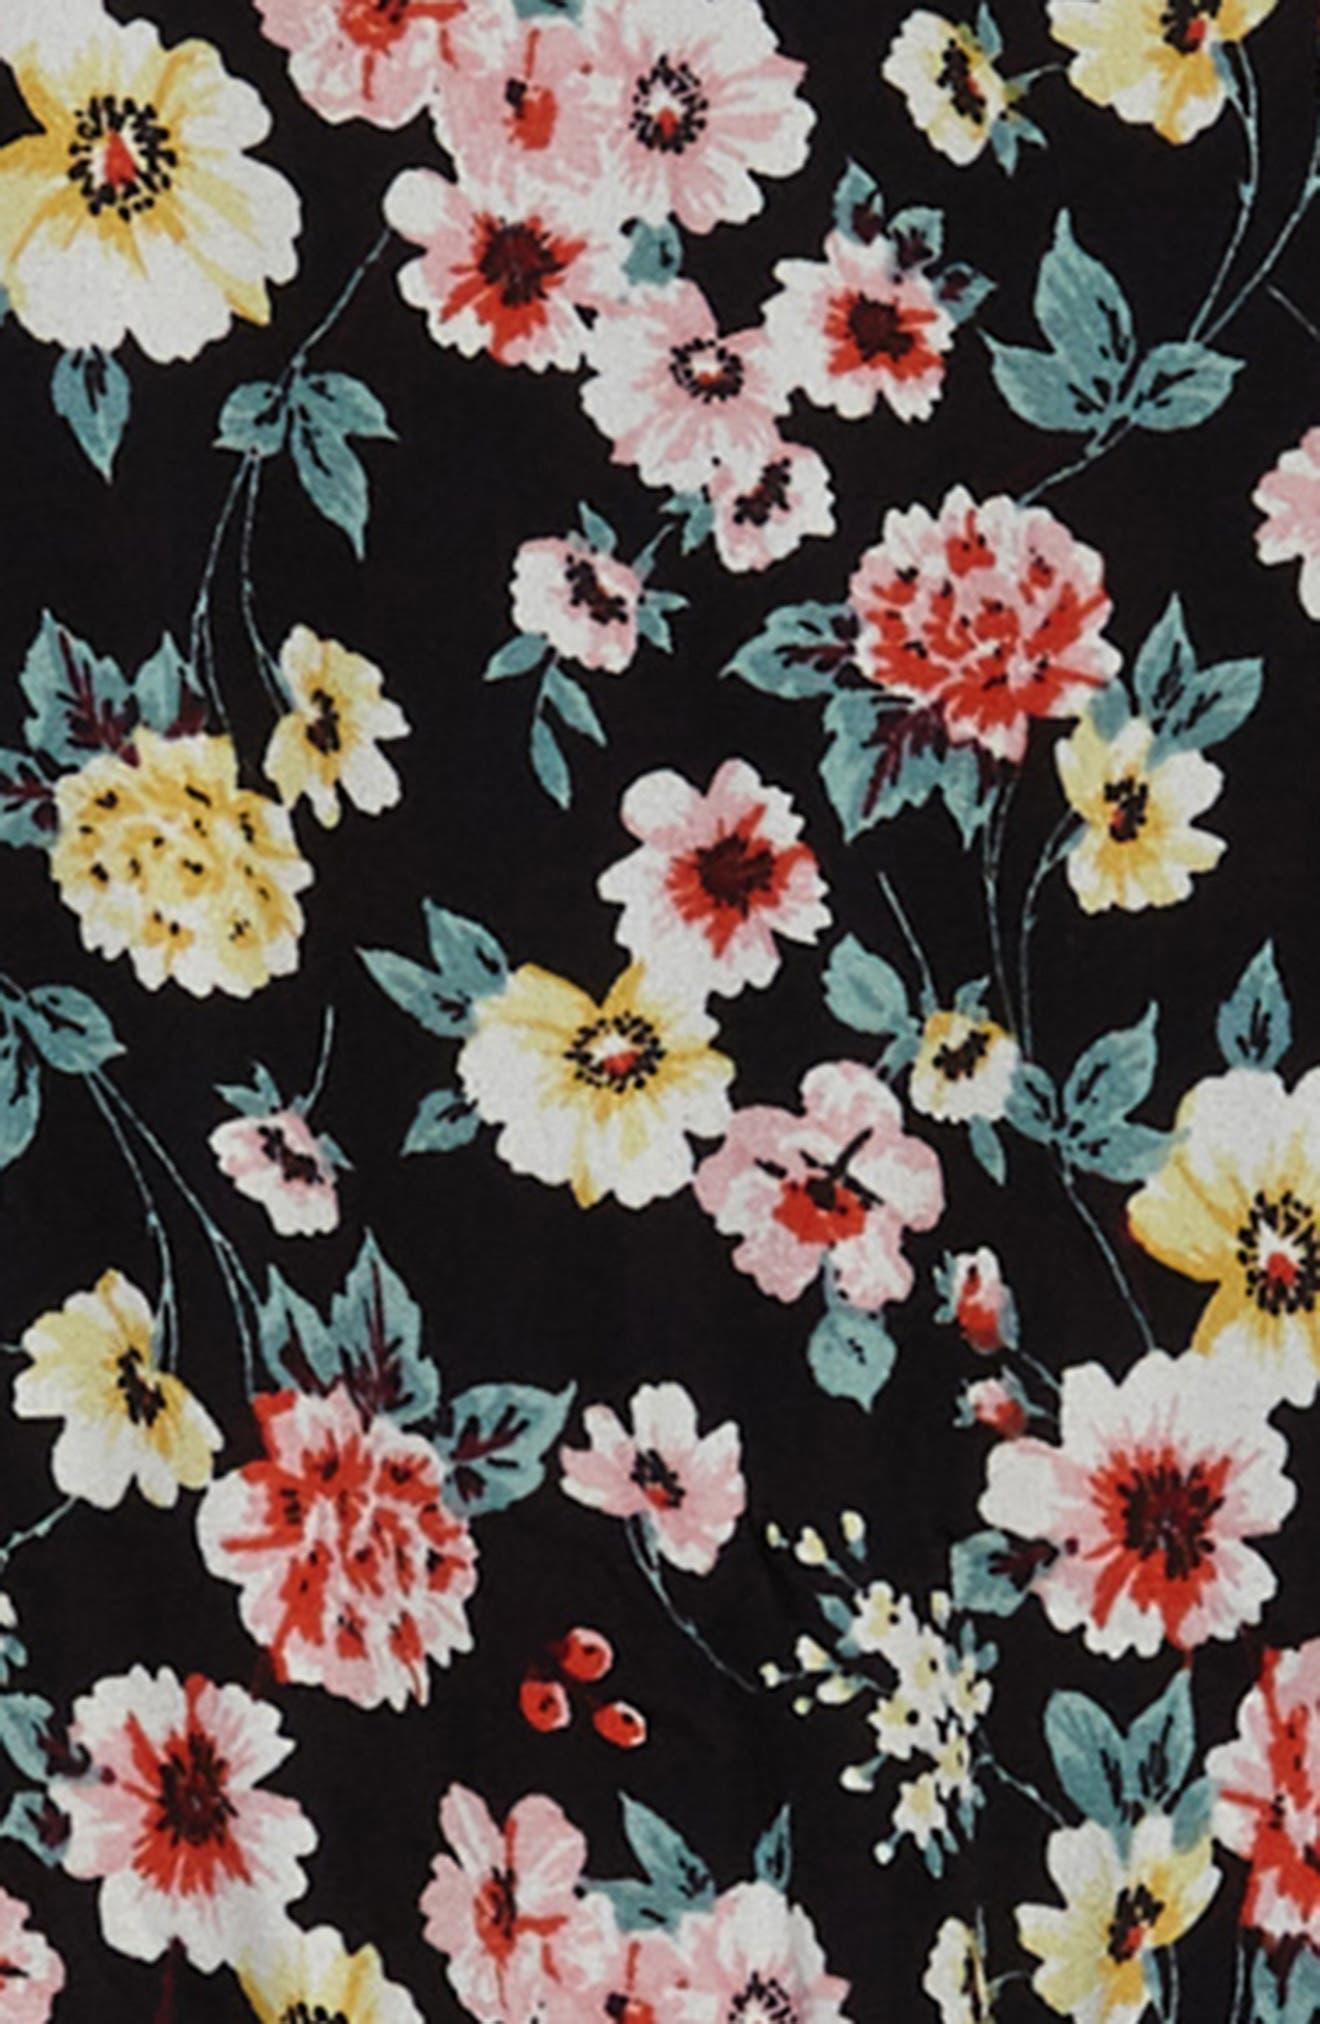 Floral Print Romper,                             Alternate thumbnail 2, color,                             001